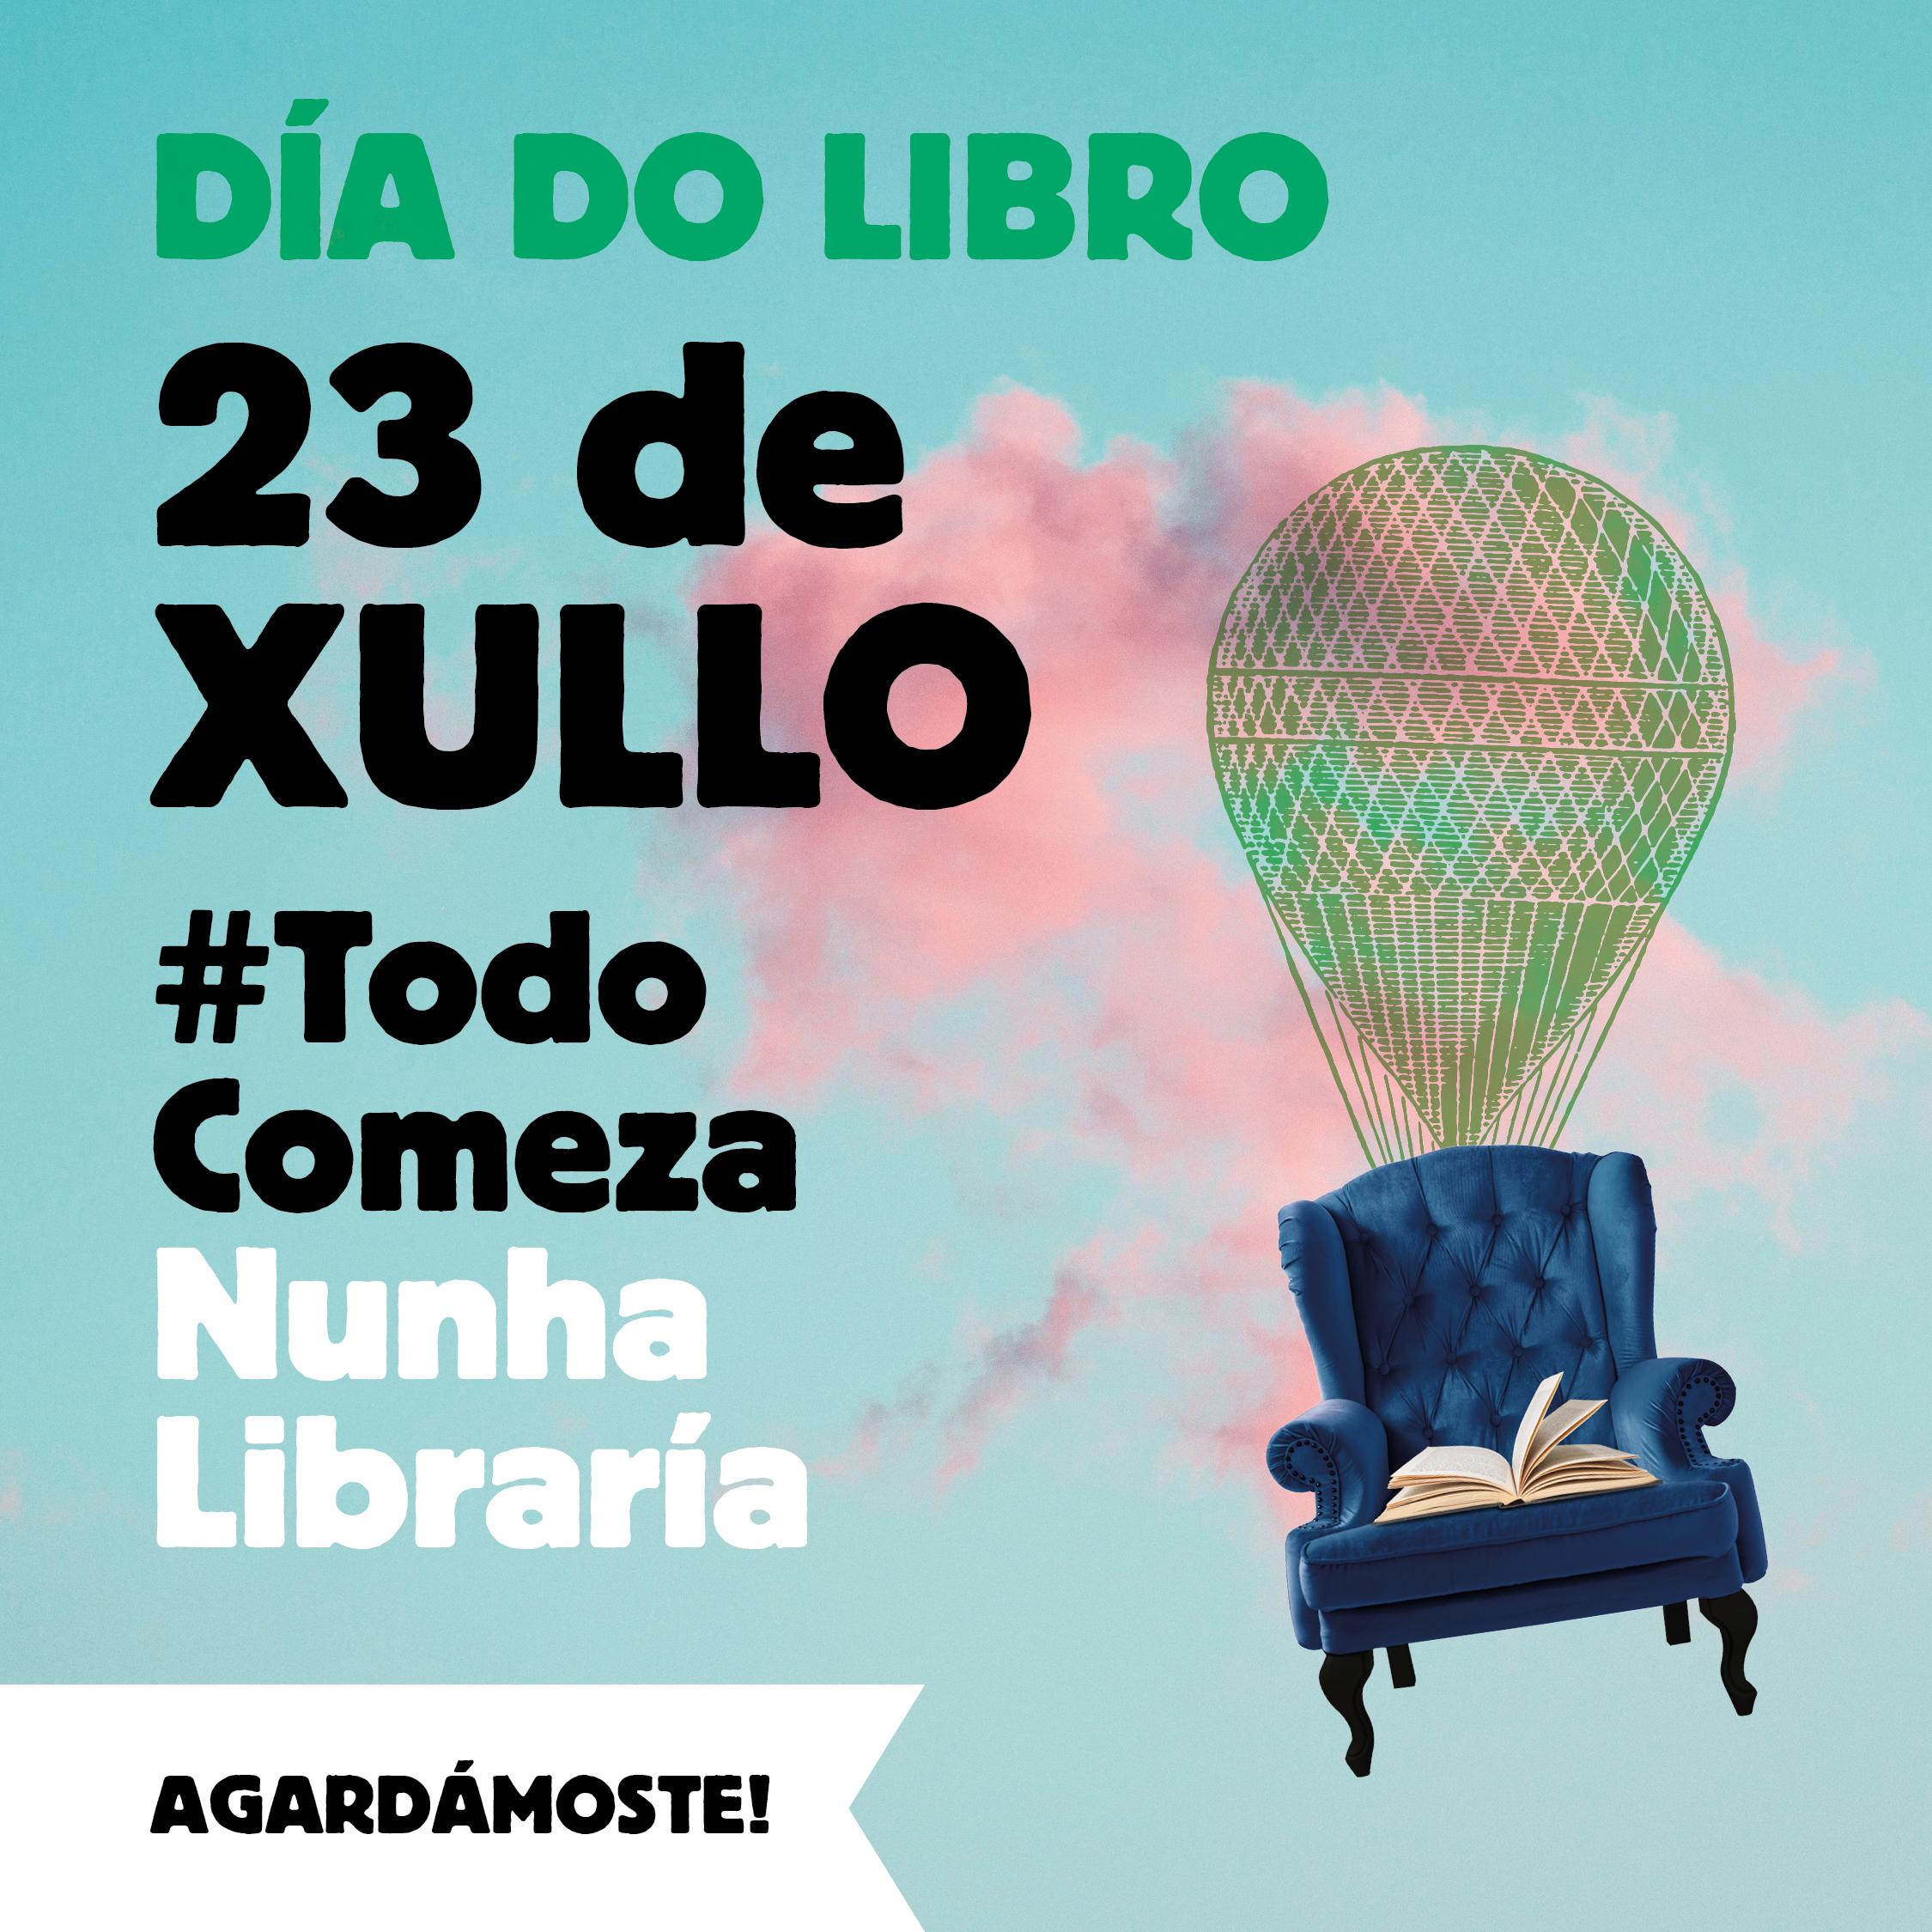 http://culturagalega.gal/imaxes/edicion/Galego_1080x1080.jpg